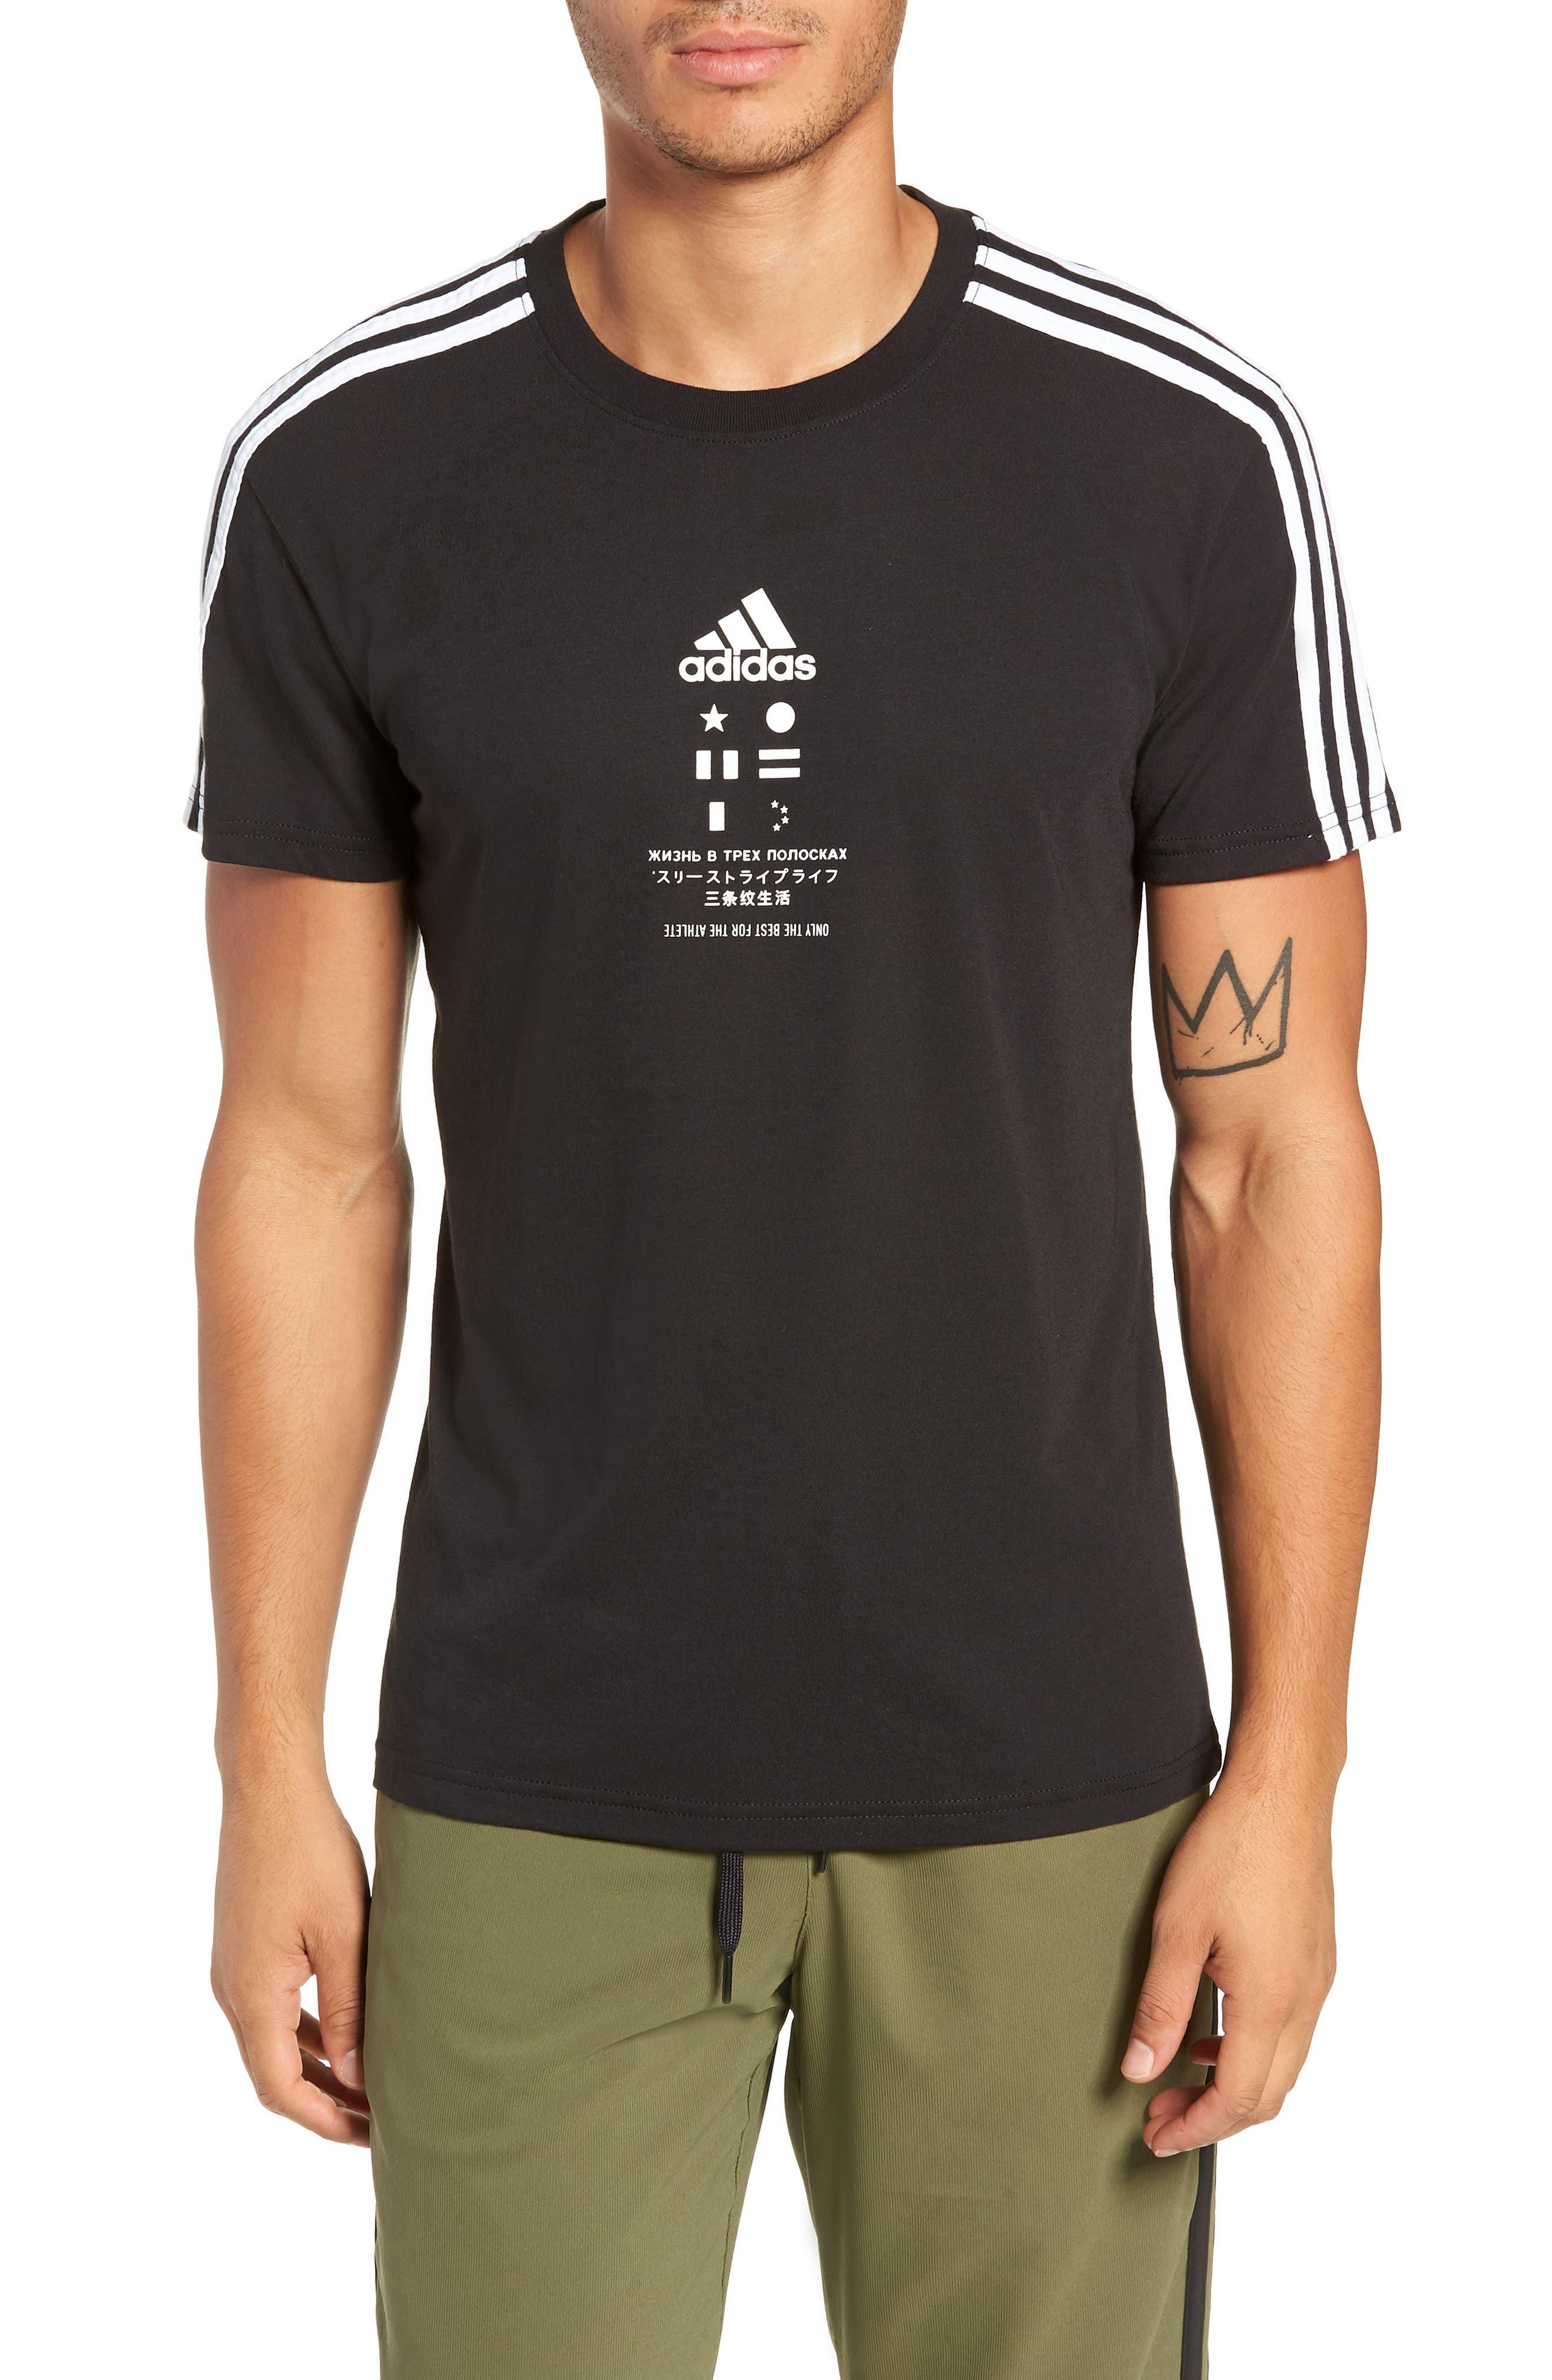 Adidas Ultimate 2.0 Technical T-Shirt, Black